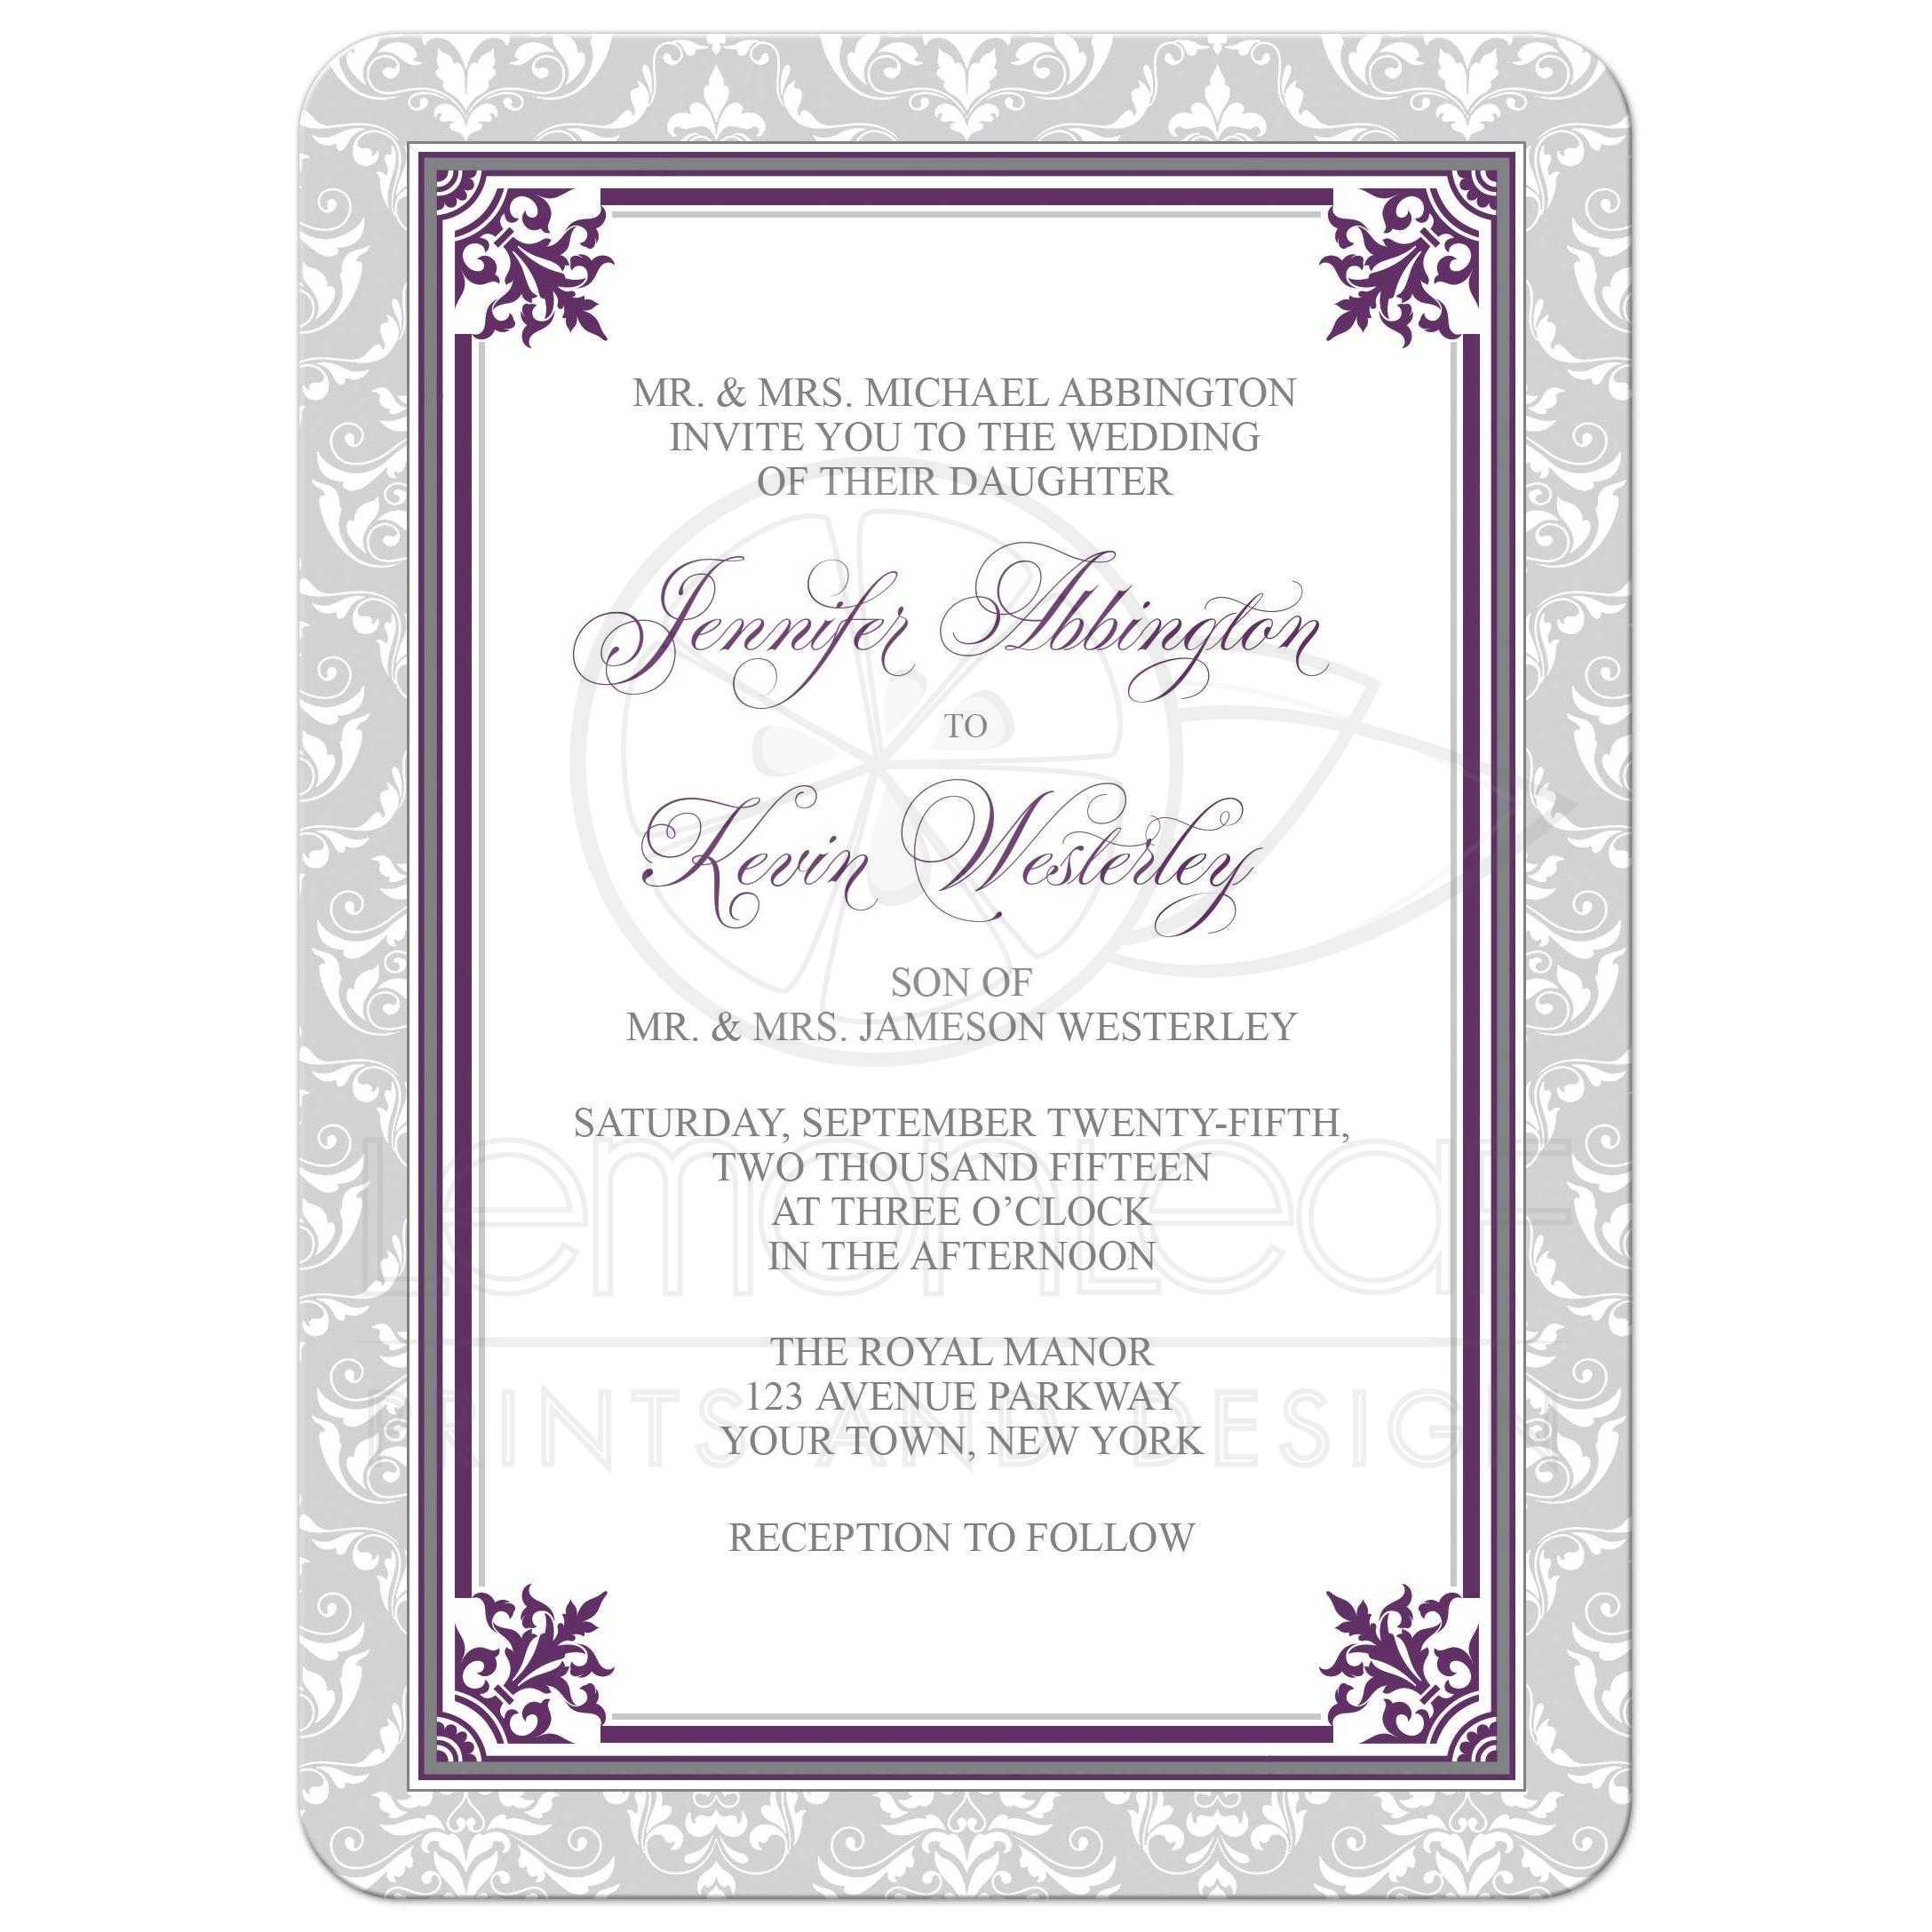 Damask Wedding Invitations is luxury invitations design